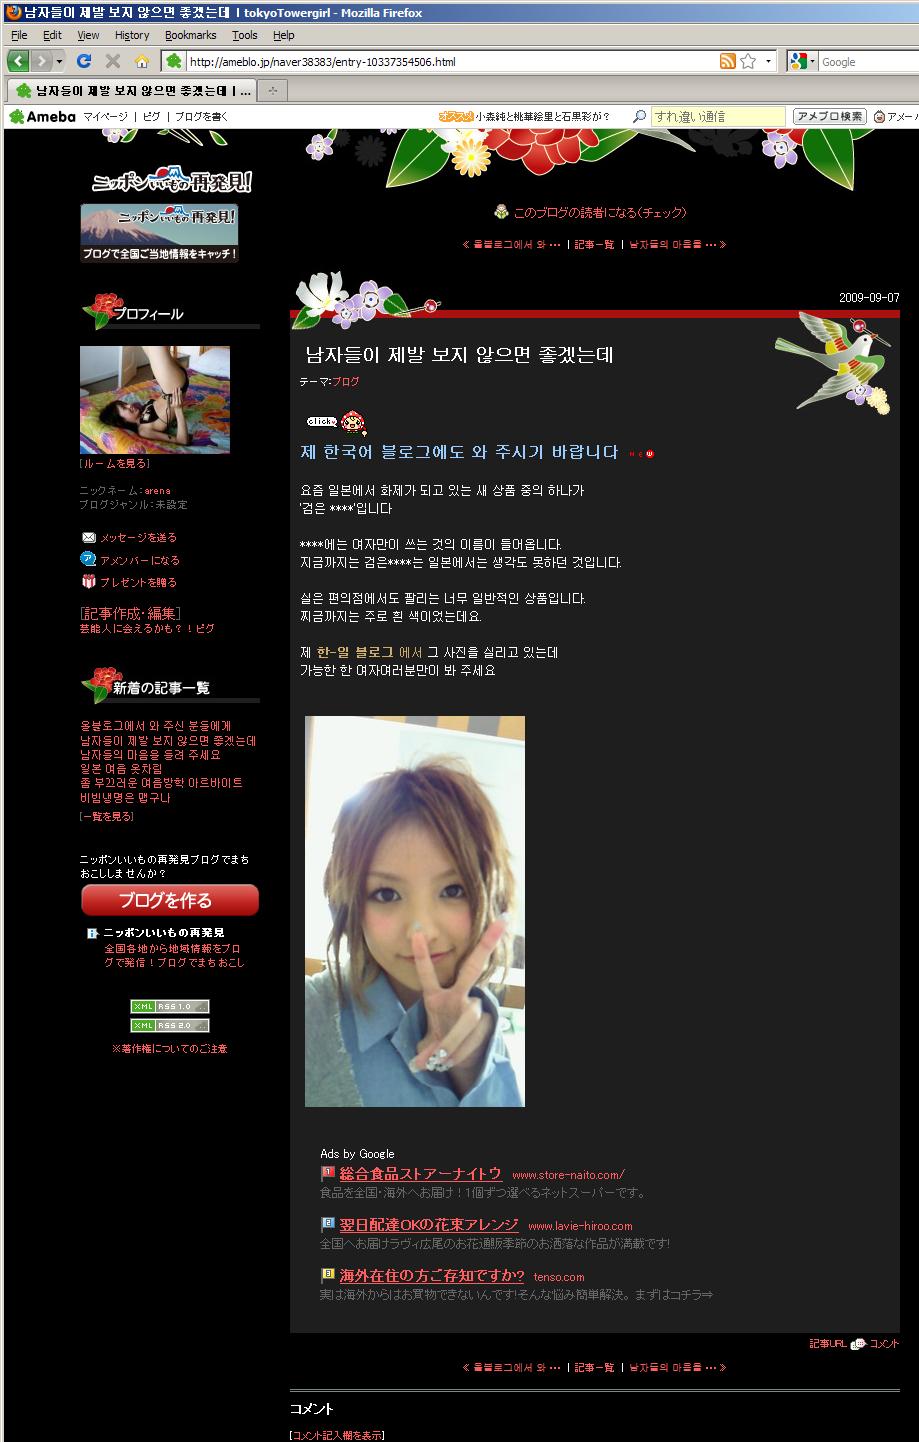 http://ameblo.jp/naver38383/entry-10337354704.html 에서 화면 캡처